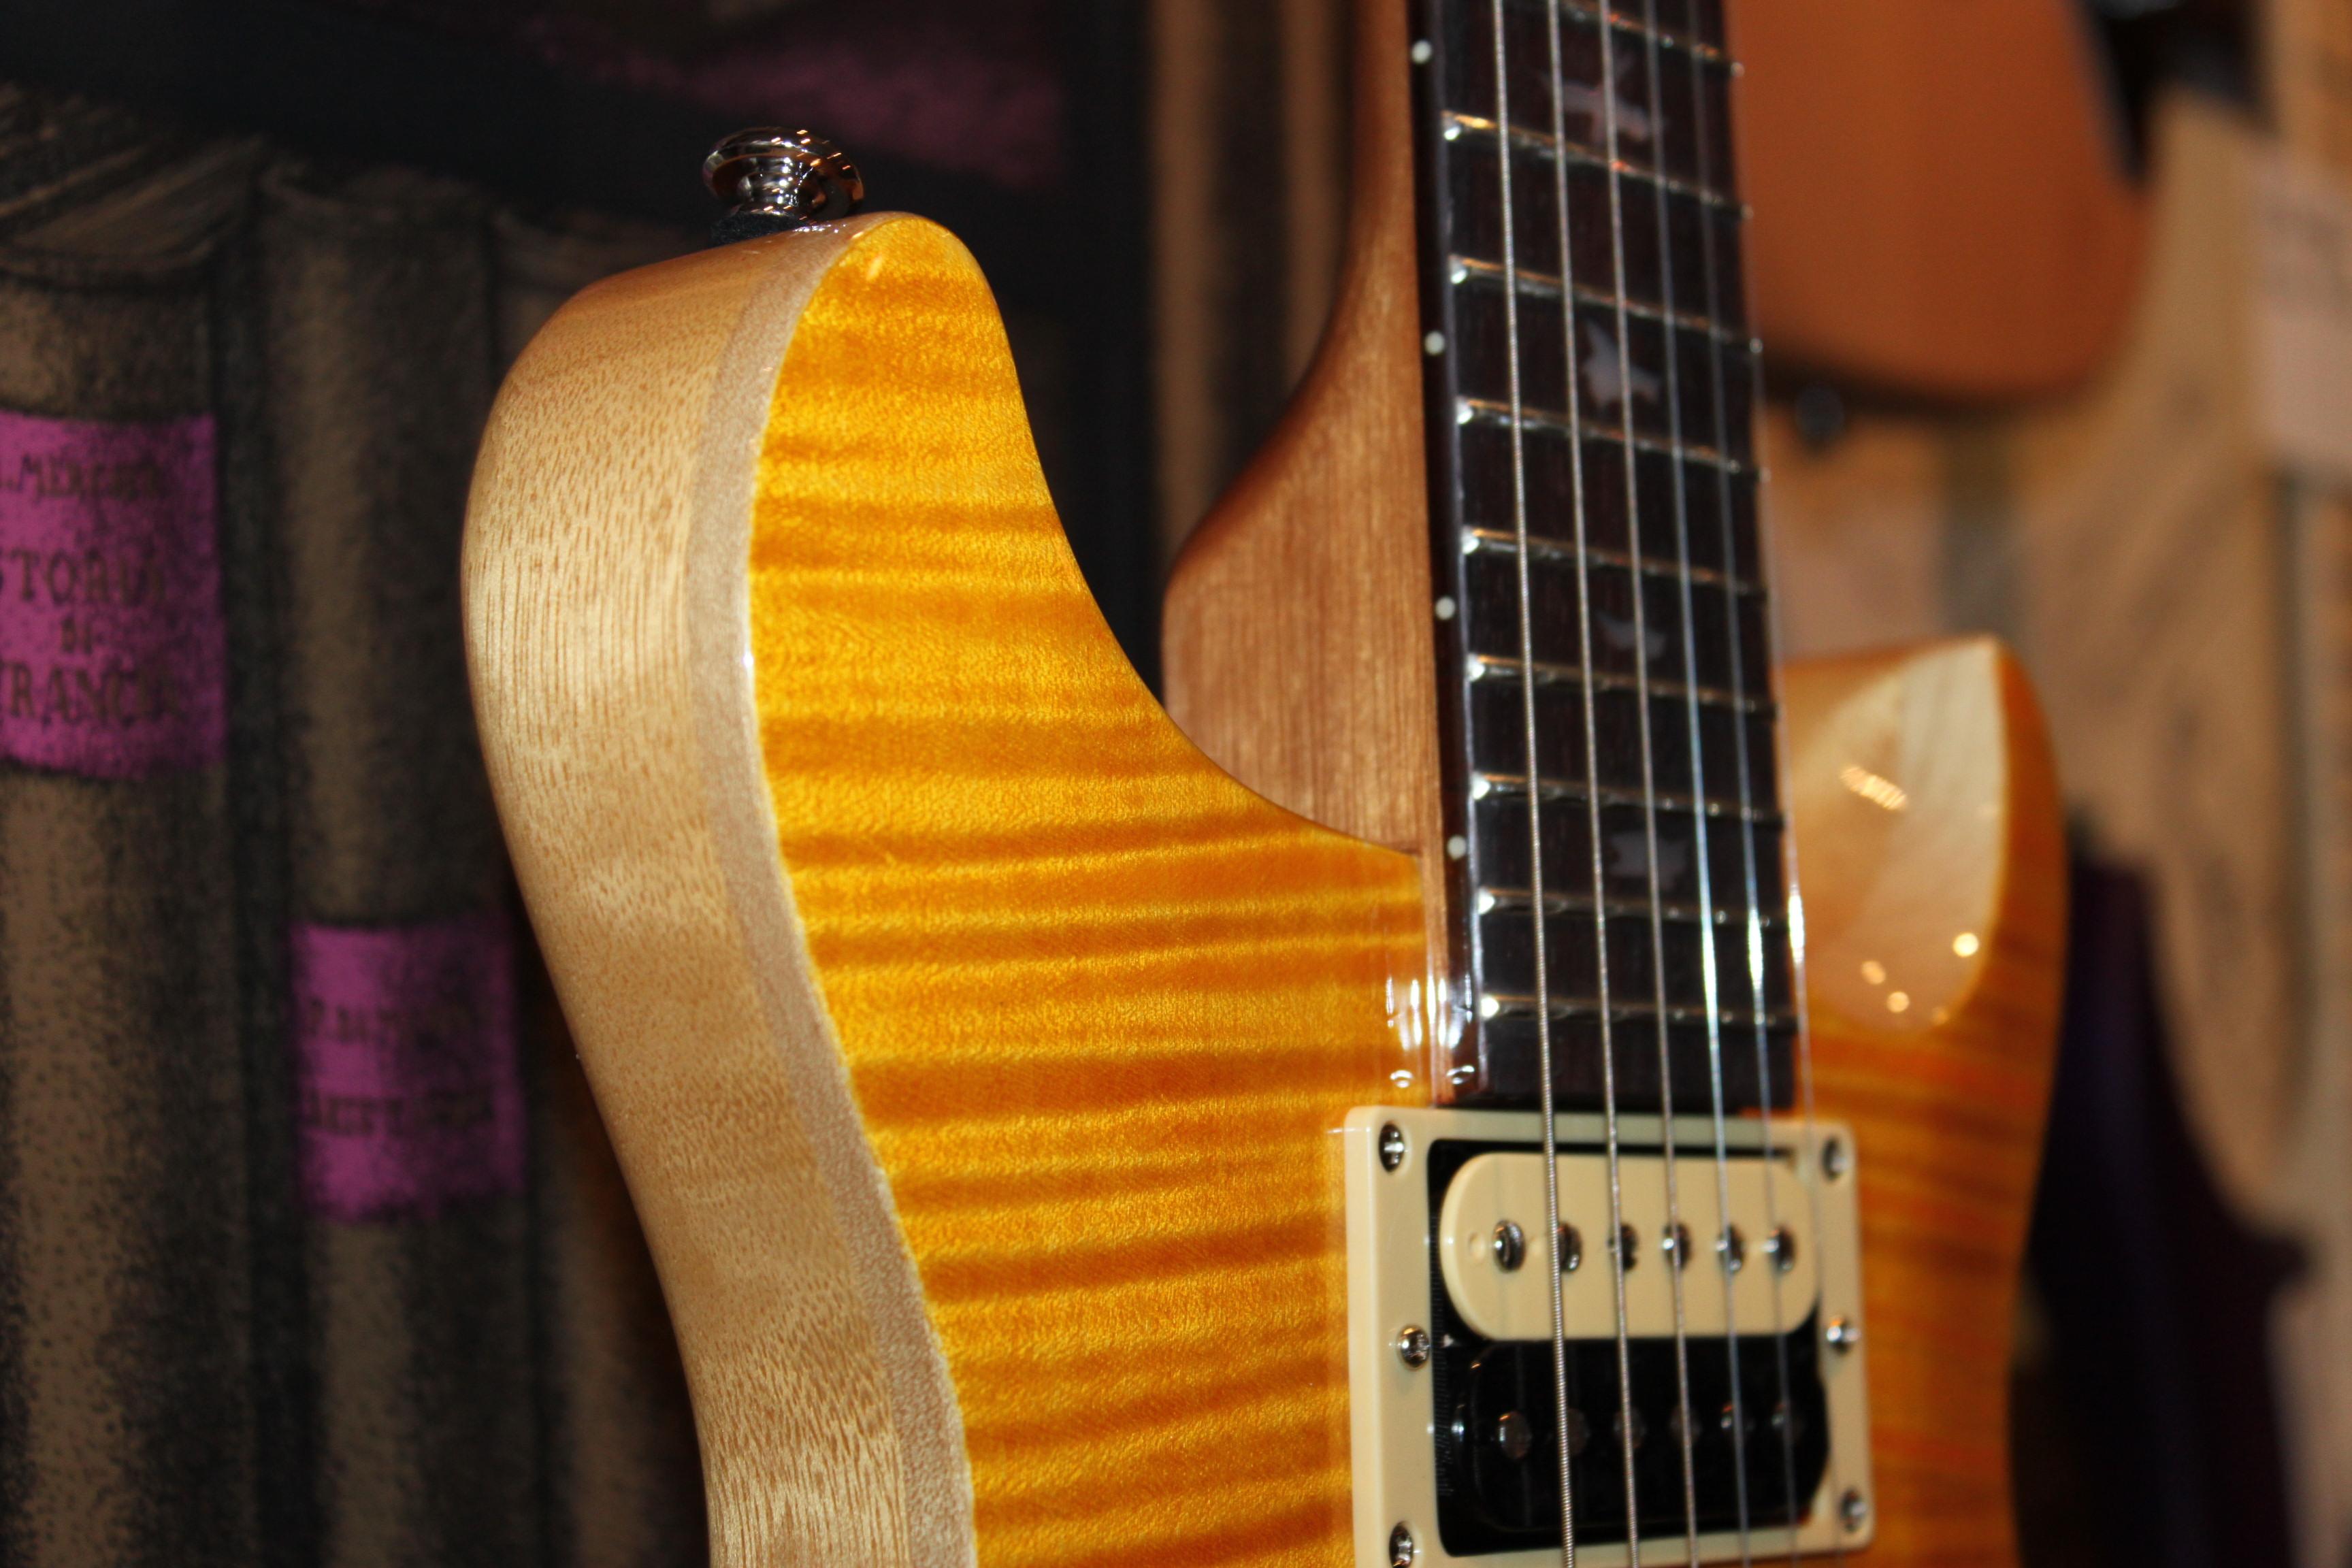 guitares electriques prs santana occasion santana yellow 500. Black Bedroom Furniture Sets. Home Design Ideas